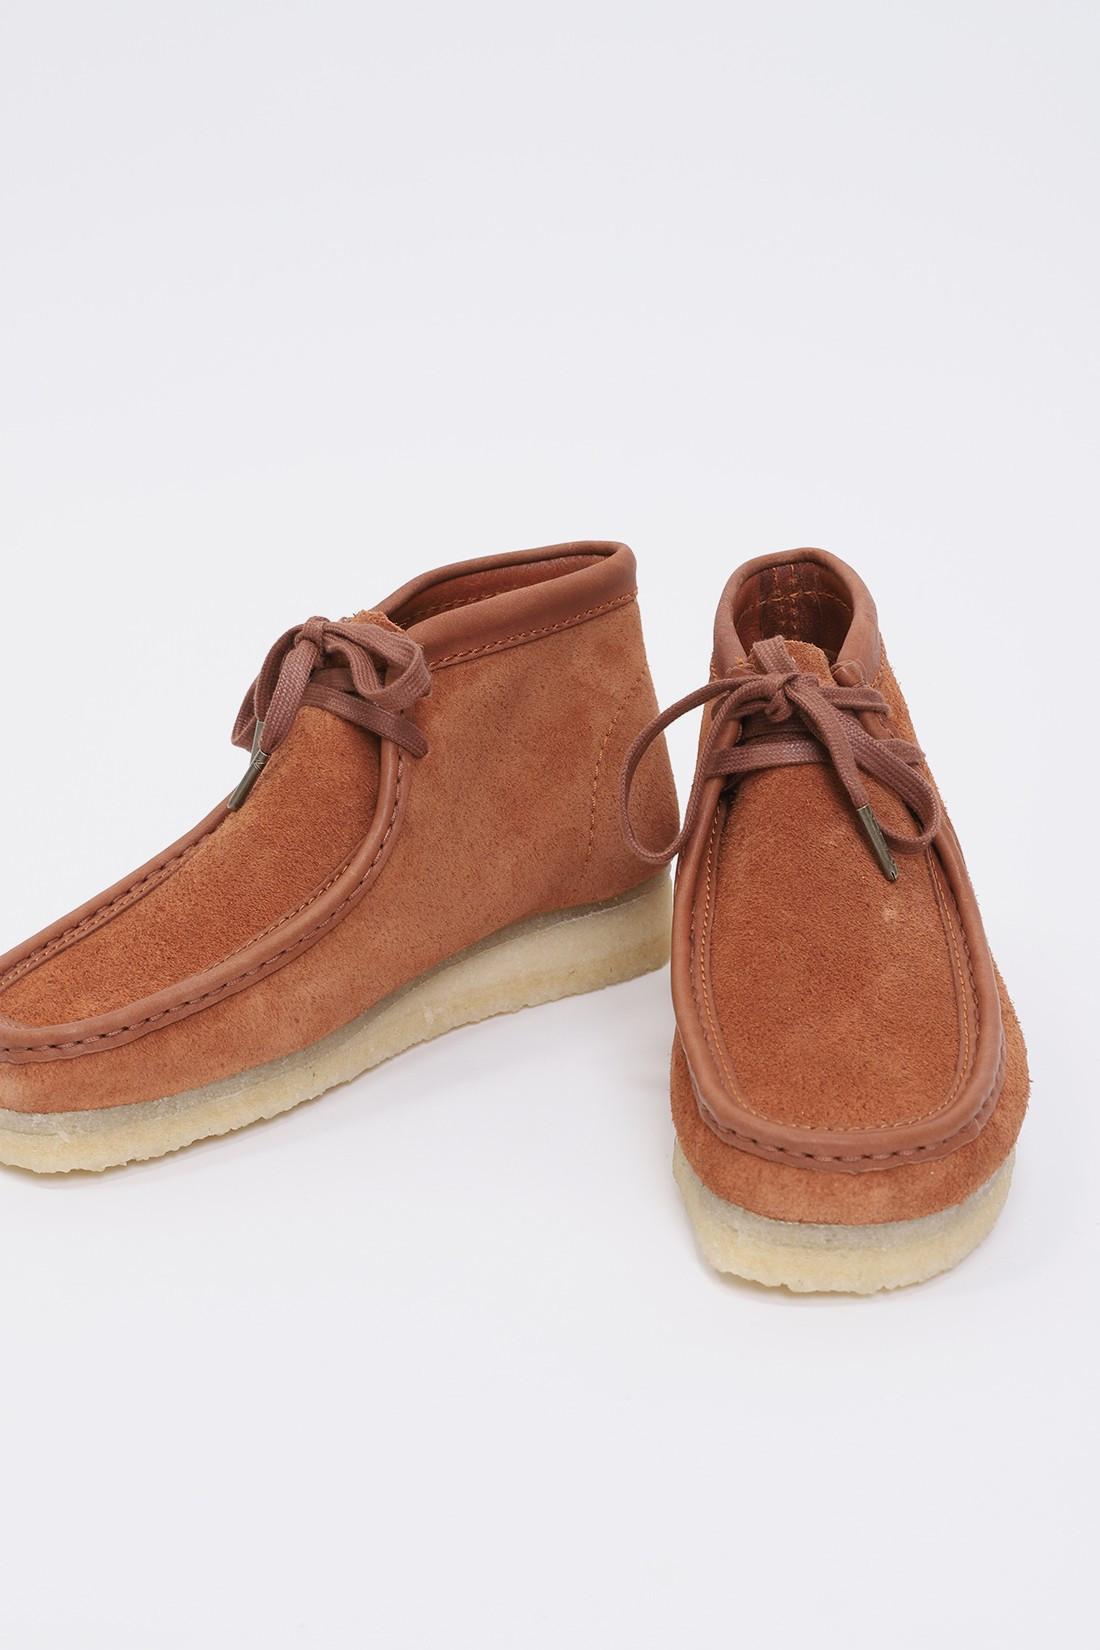 CLARKS ORIGINALS / Wallabee boot Tan hairy suede